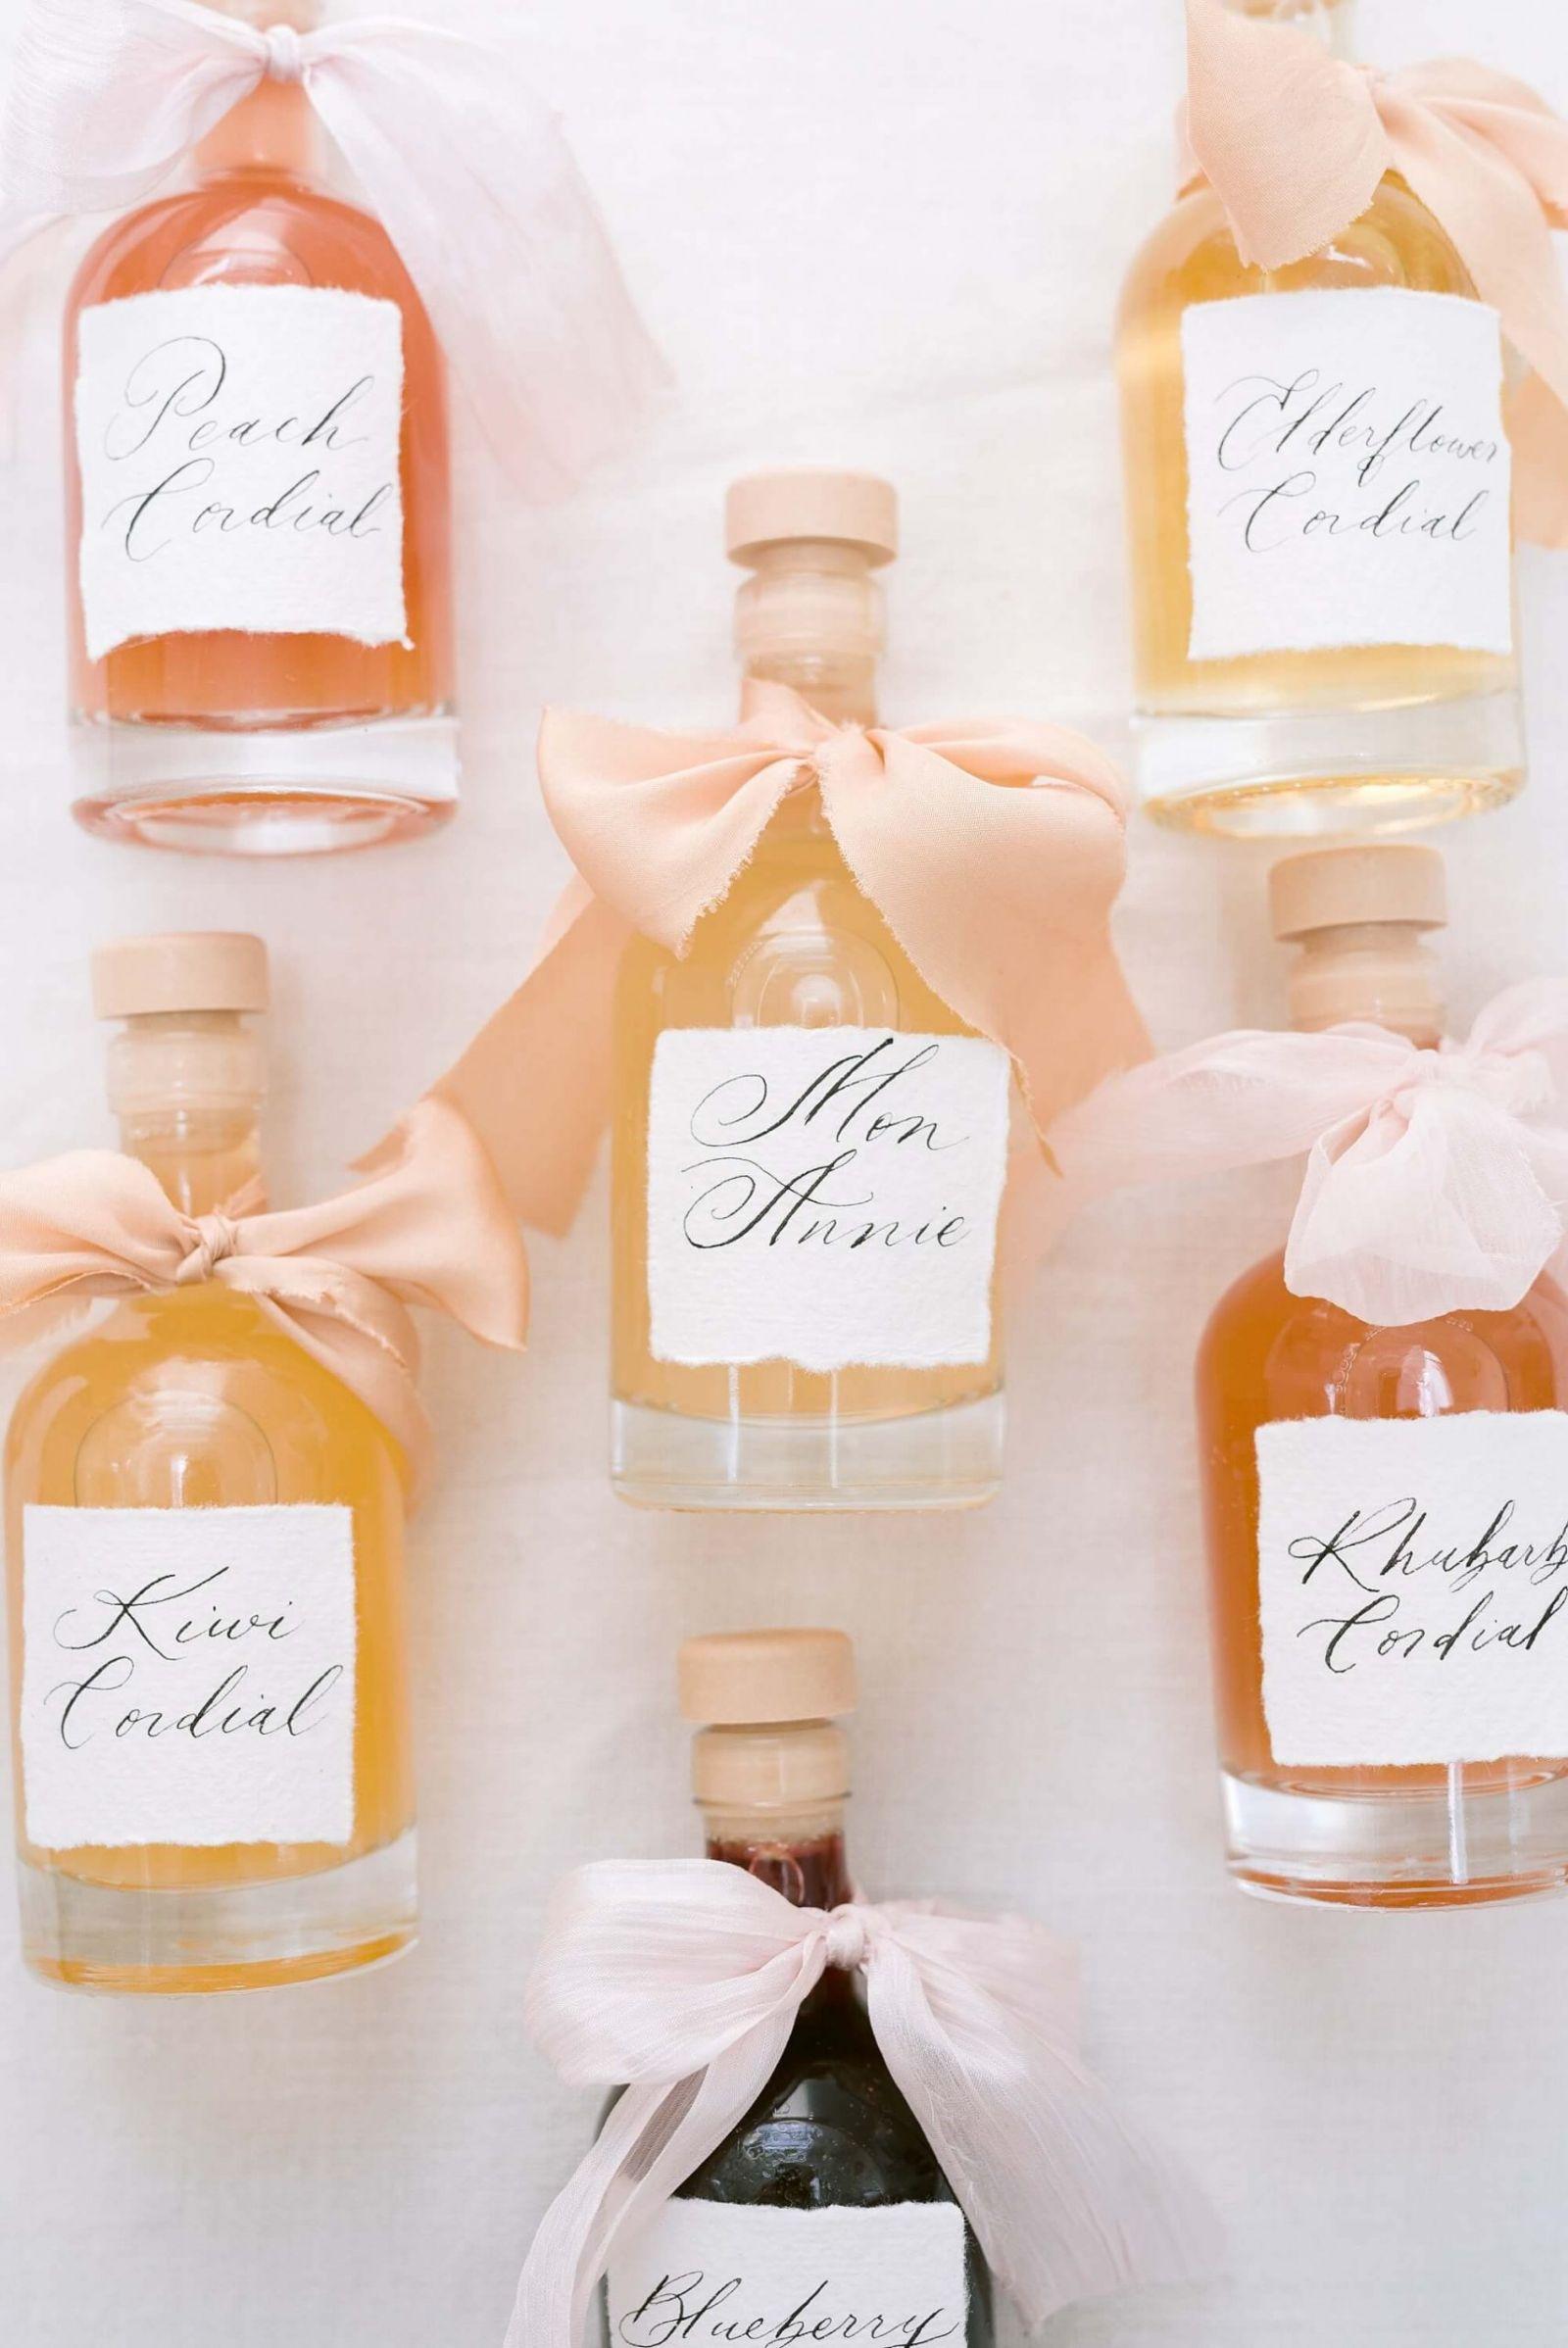 Luxury wedding favour ideas